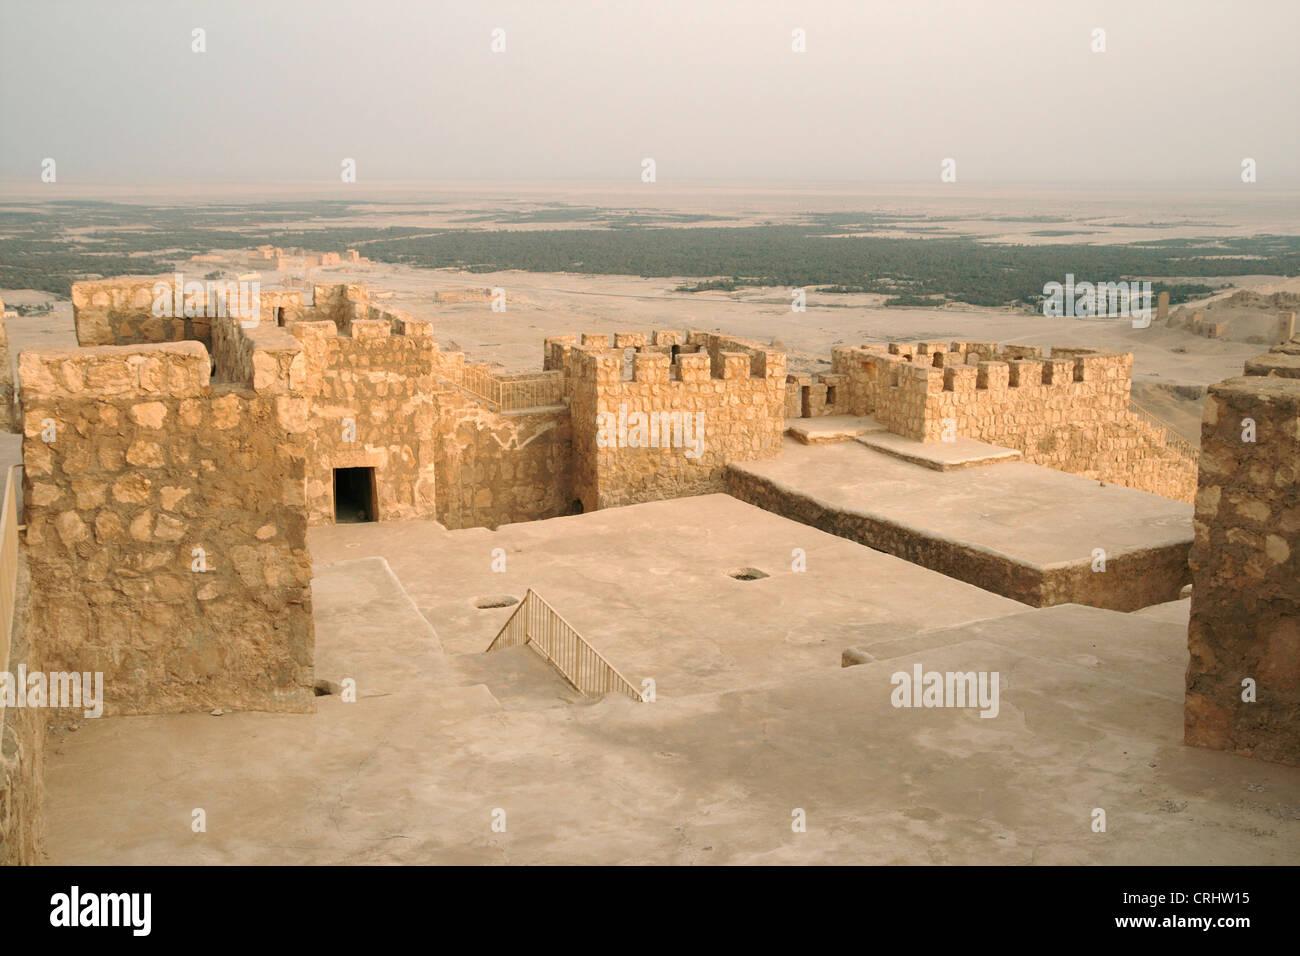 Arab castle, Qala'at Ibn Maan, Syria, Palmyra - Stock Image